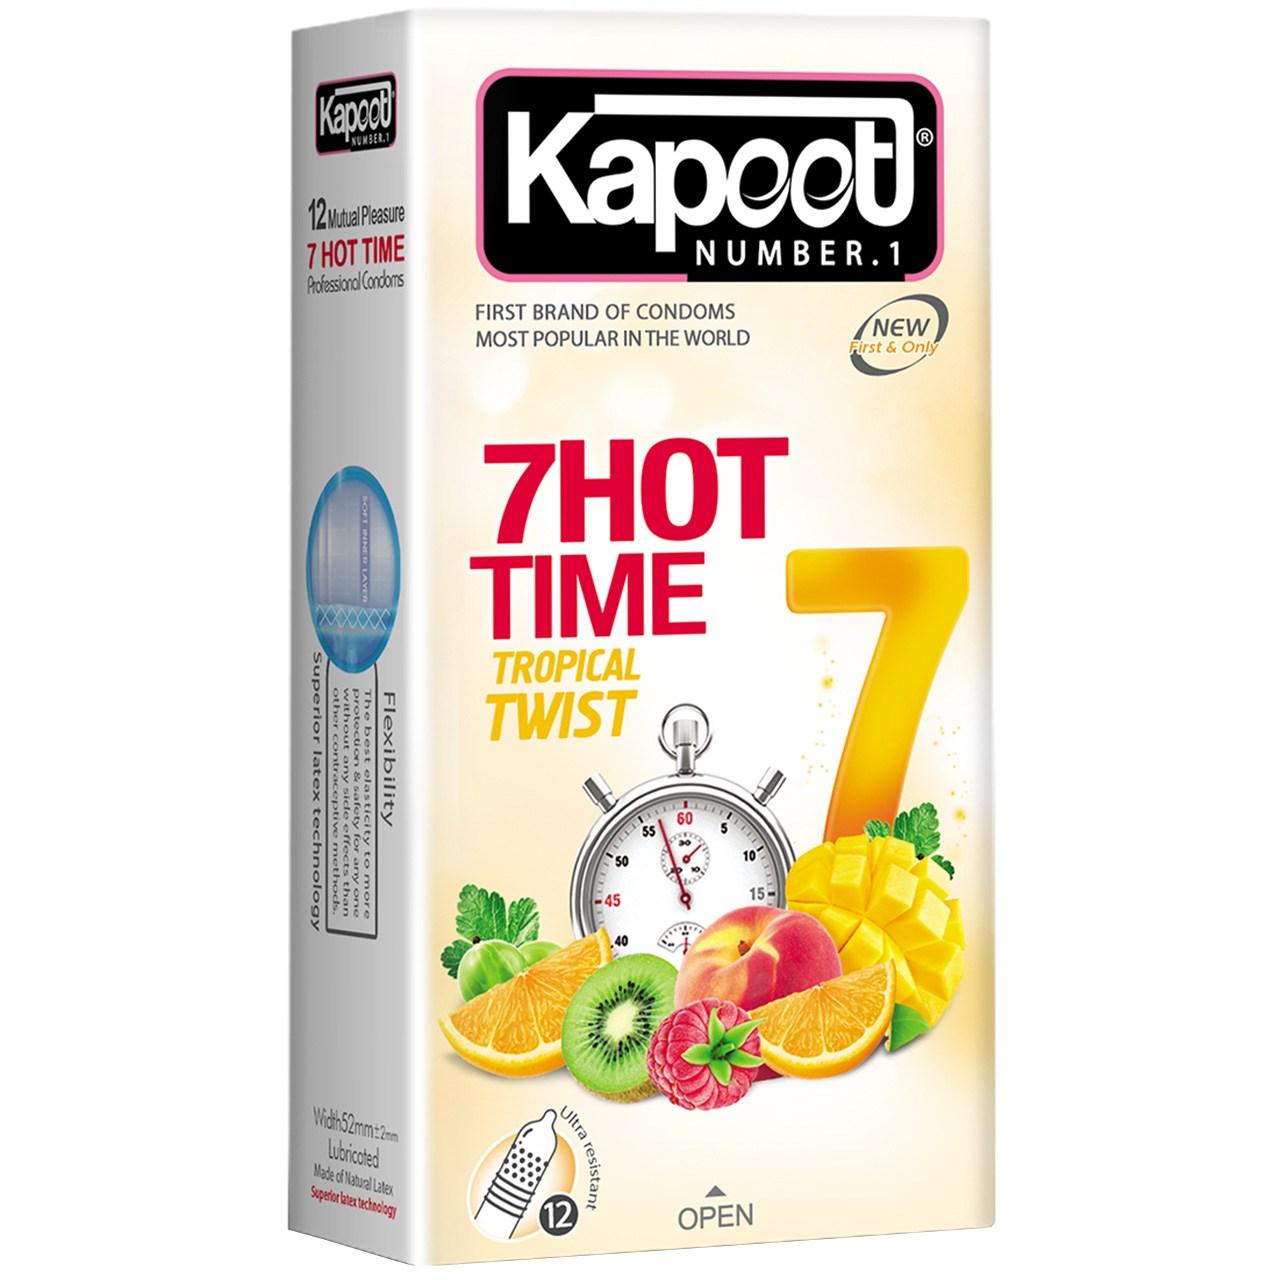 عکس کاندوم کاپوت مدل 7Hot Time  بسته 12 عددی